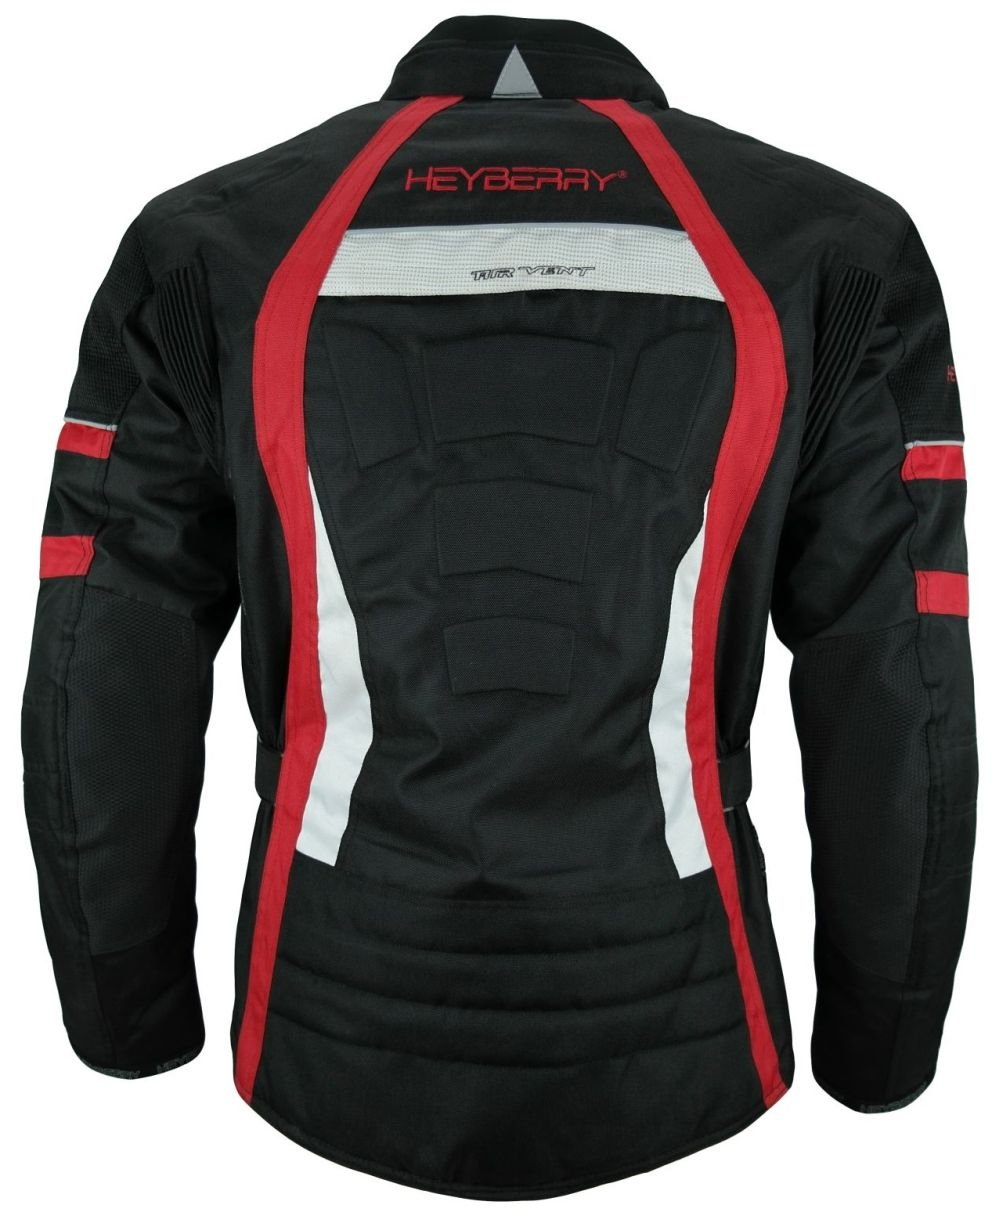 HEYBERRY Touren Motorrad Jacke Motorradjacke Textil Camouflage gr/ün Gr 5XL